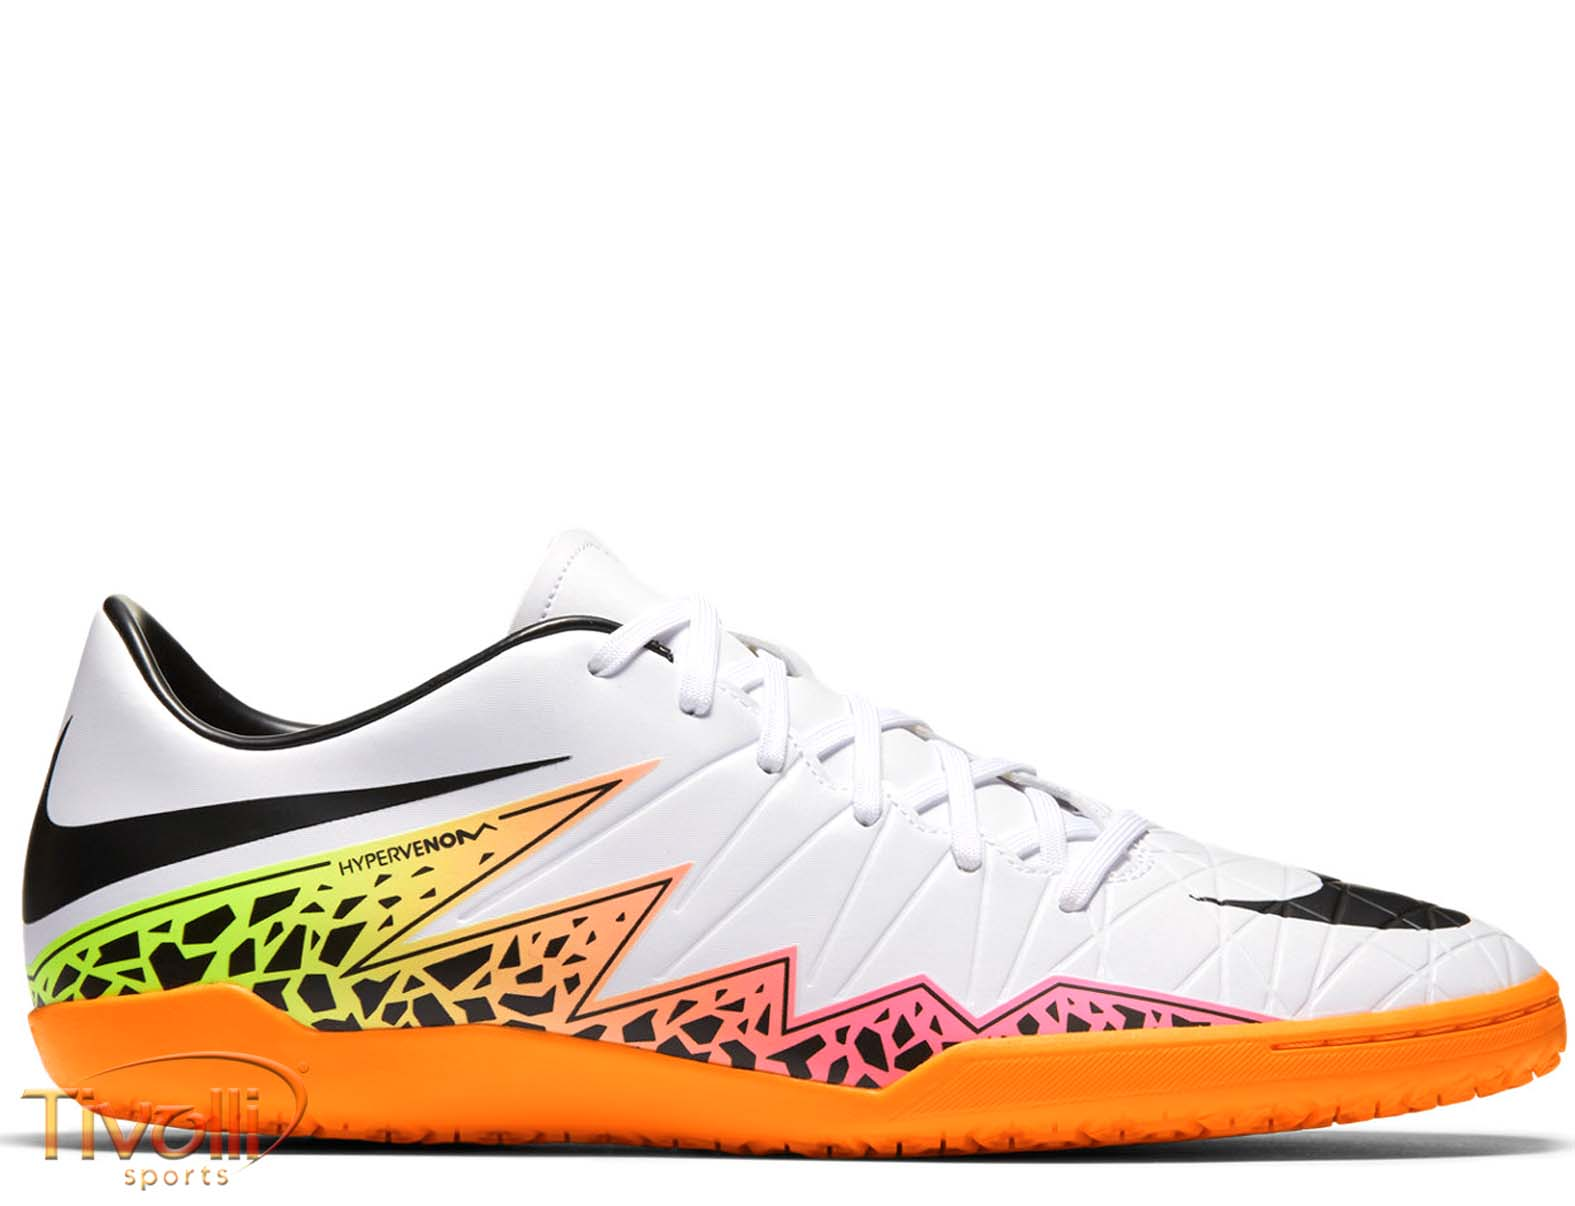 Chuteira Nike Hypervenom Phelon II IC Futsal Infantil   Branca   d7bce2884be98